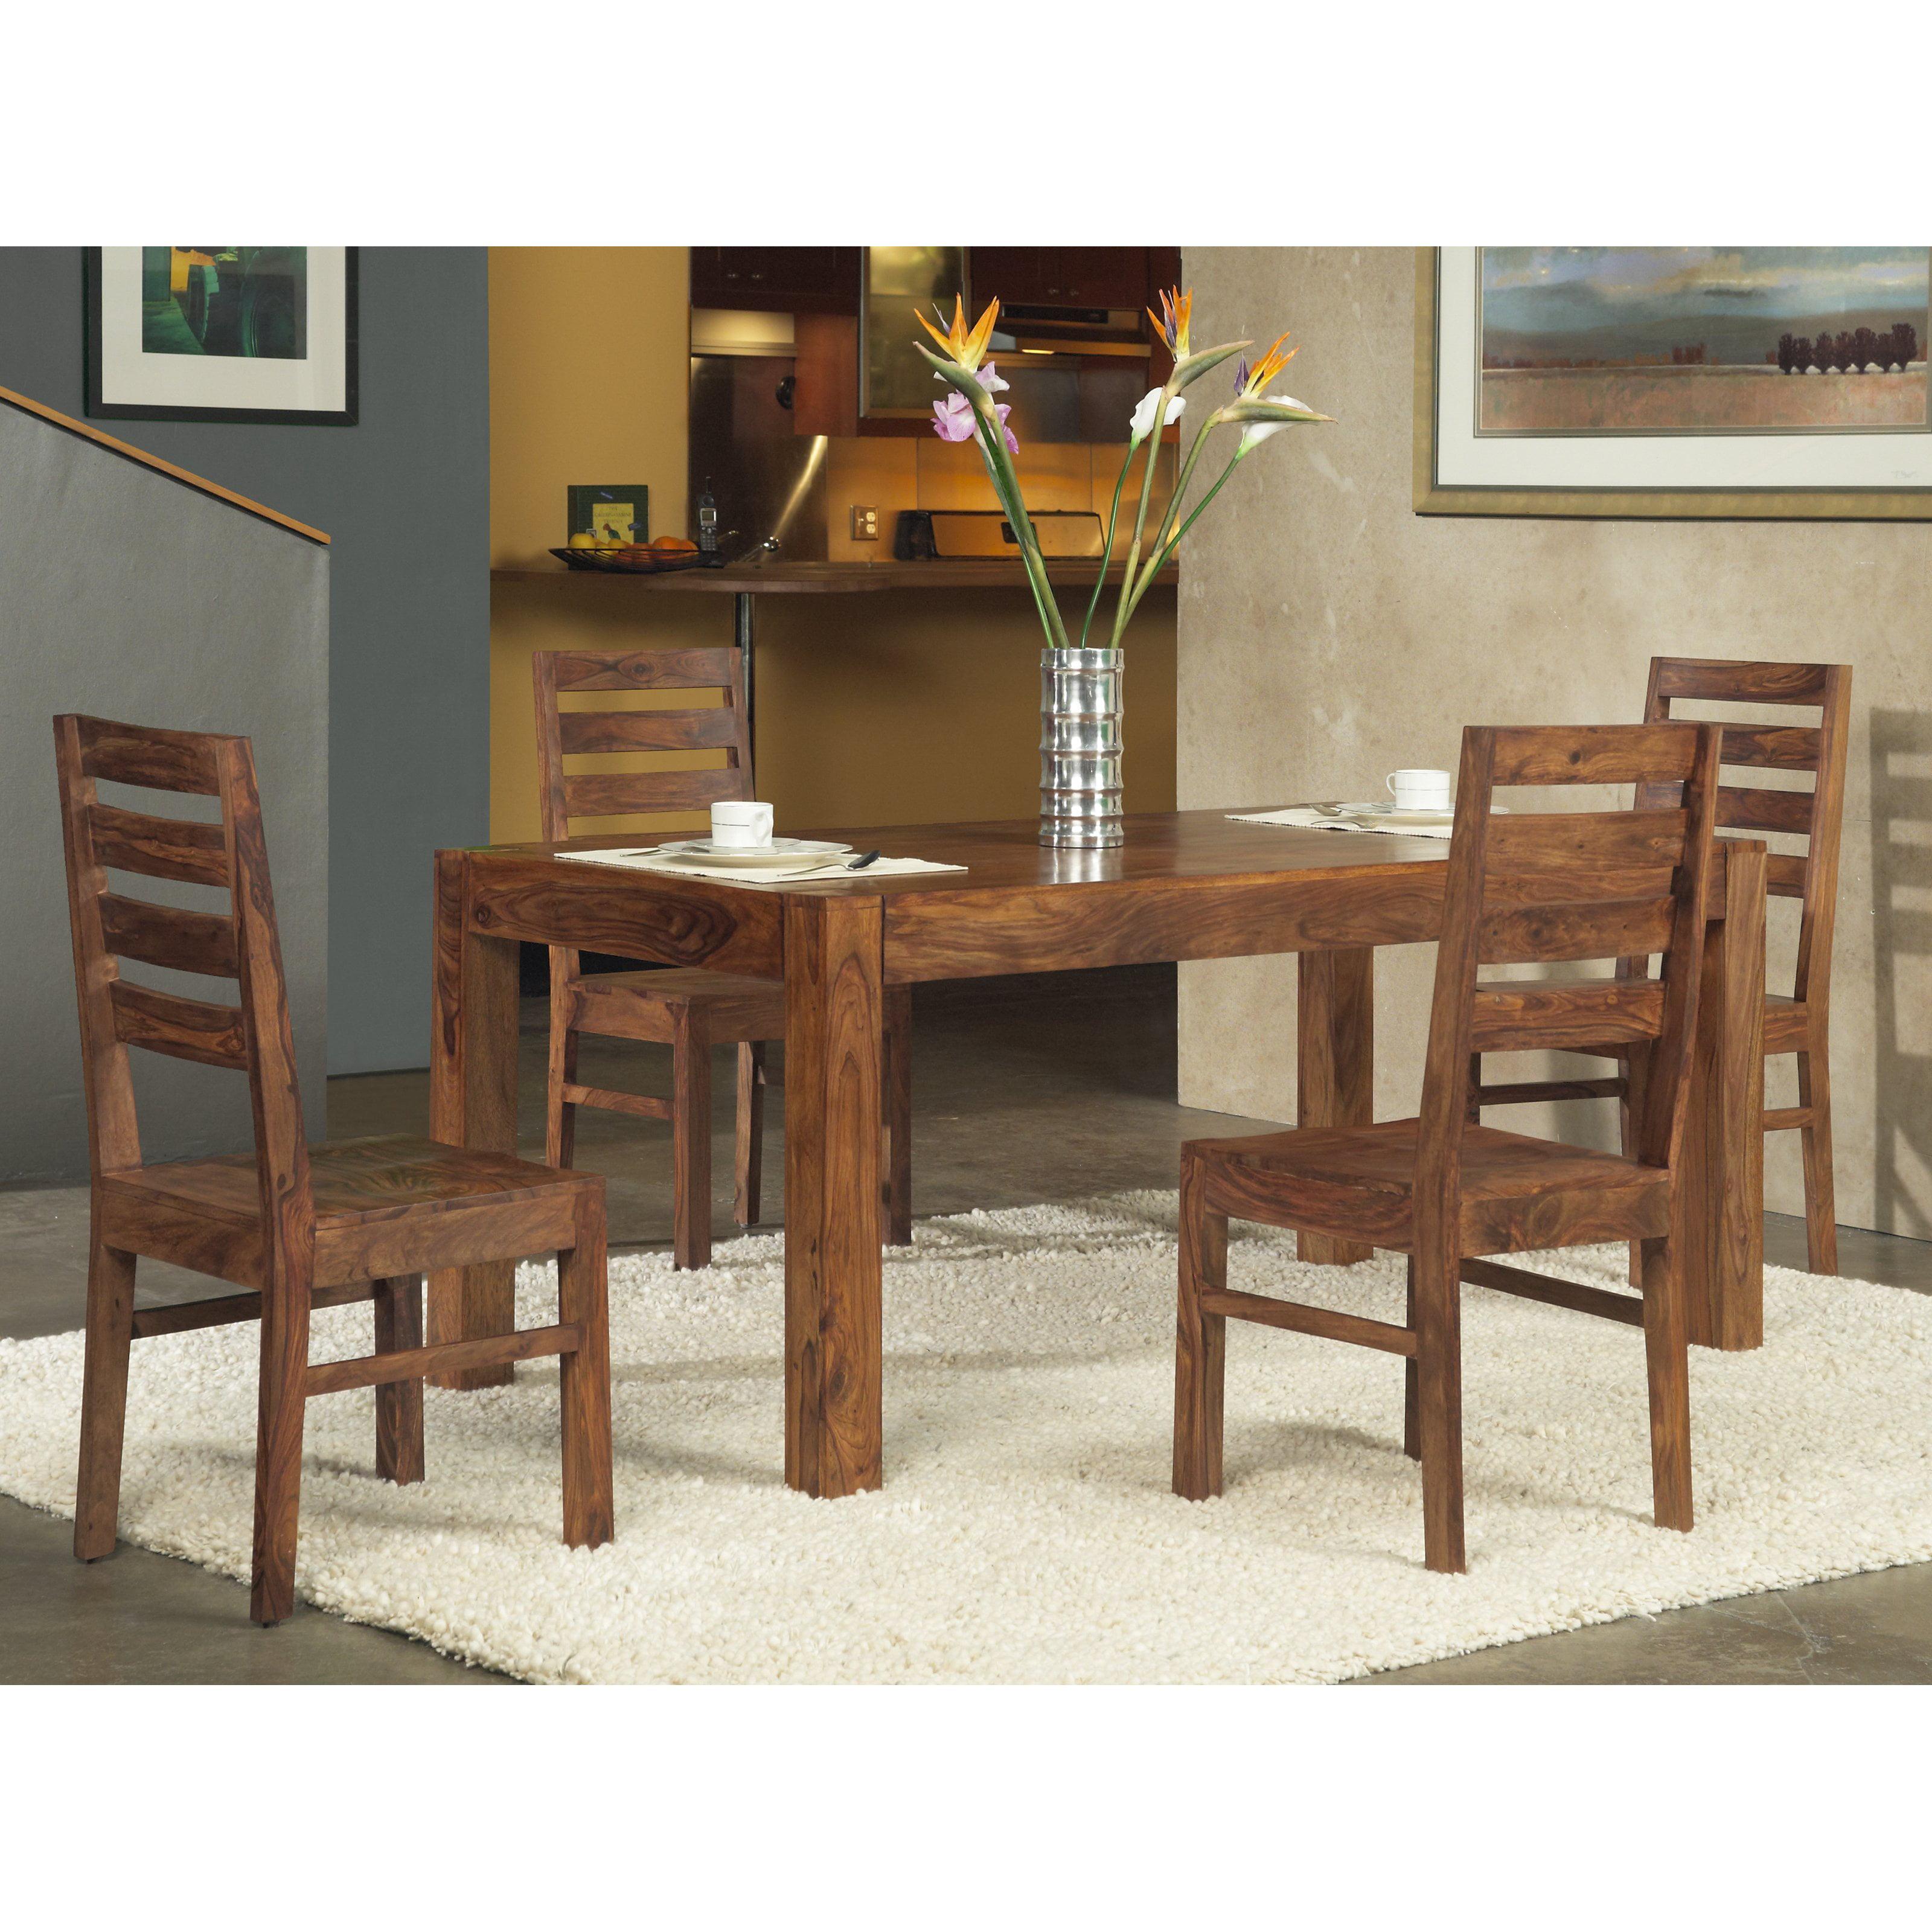 Modus Portland Round 5 Piece Dining Table Set by Modus Furniture International